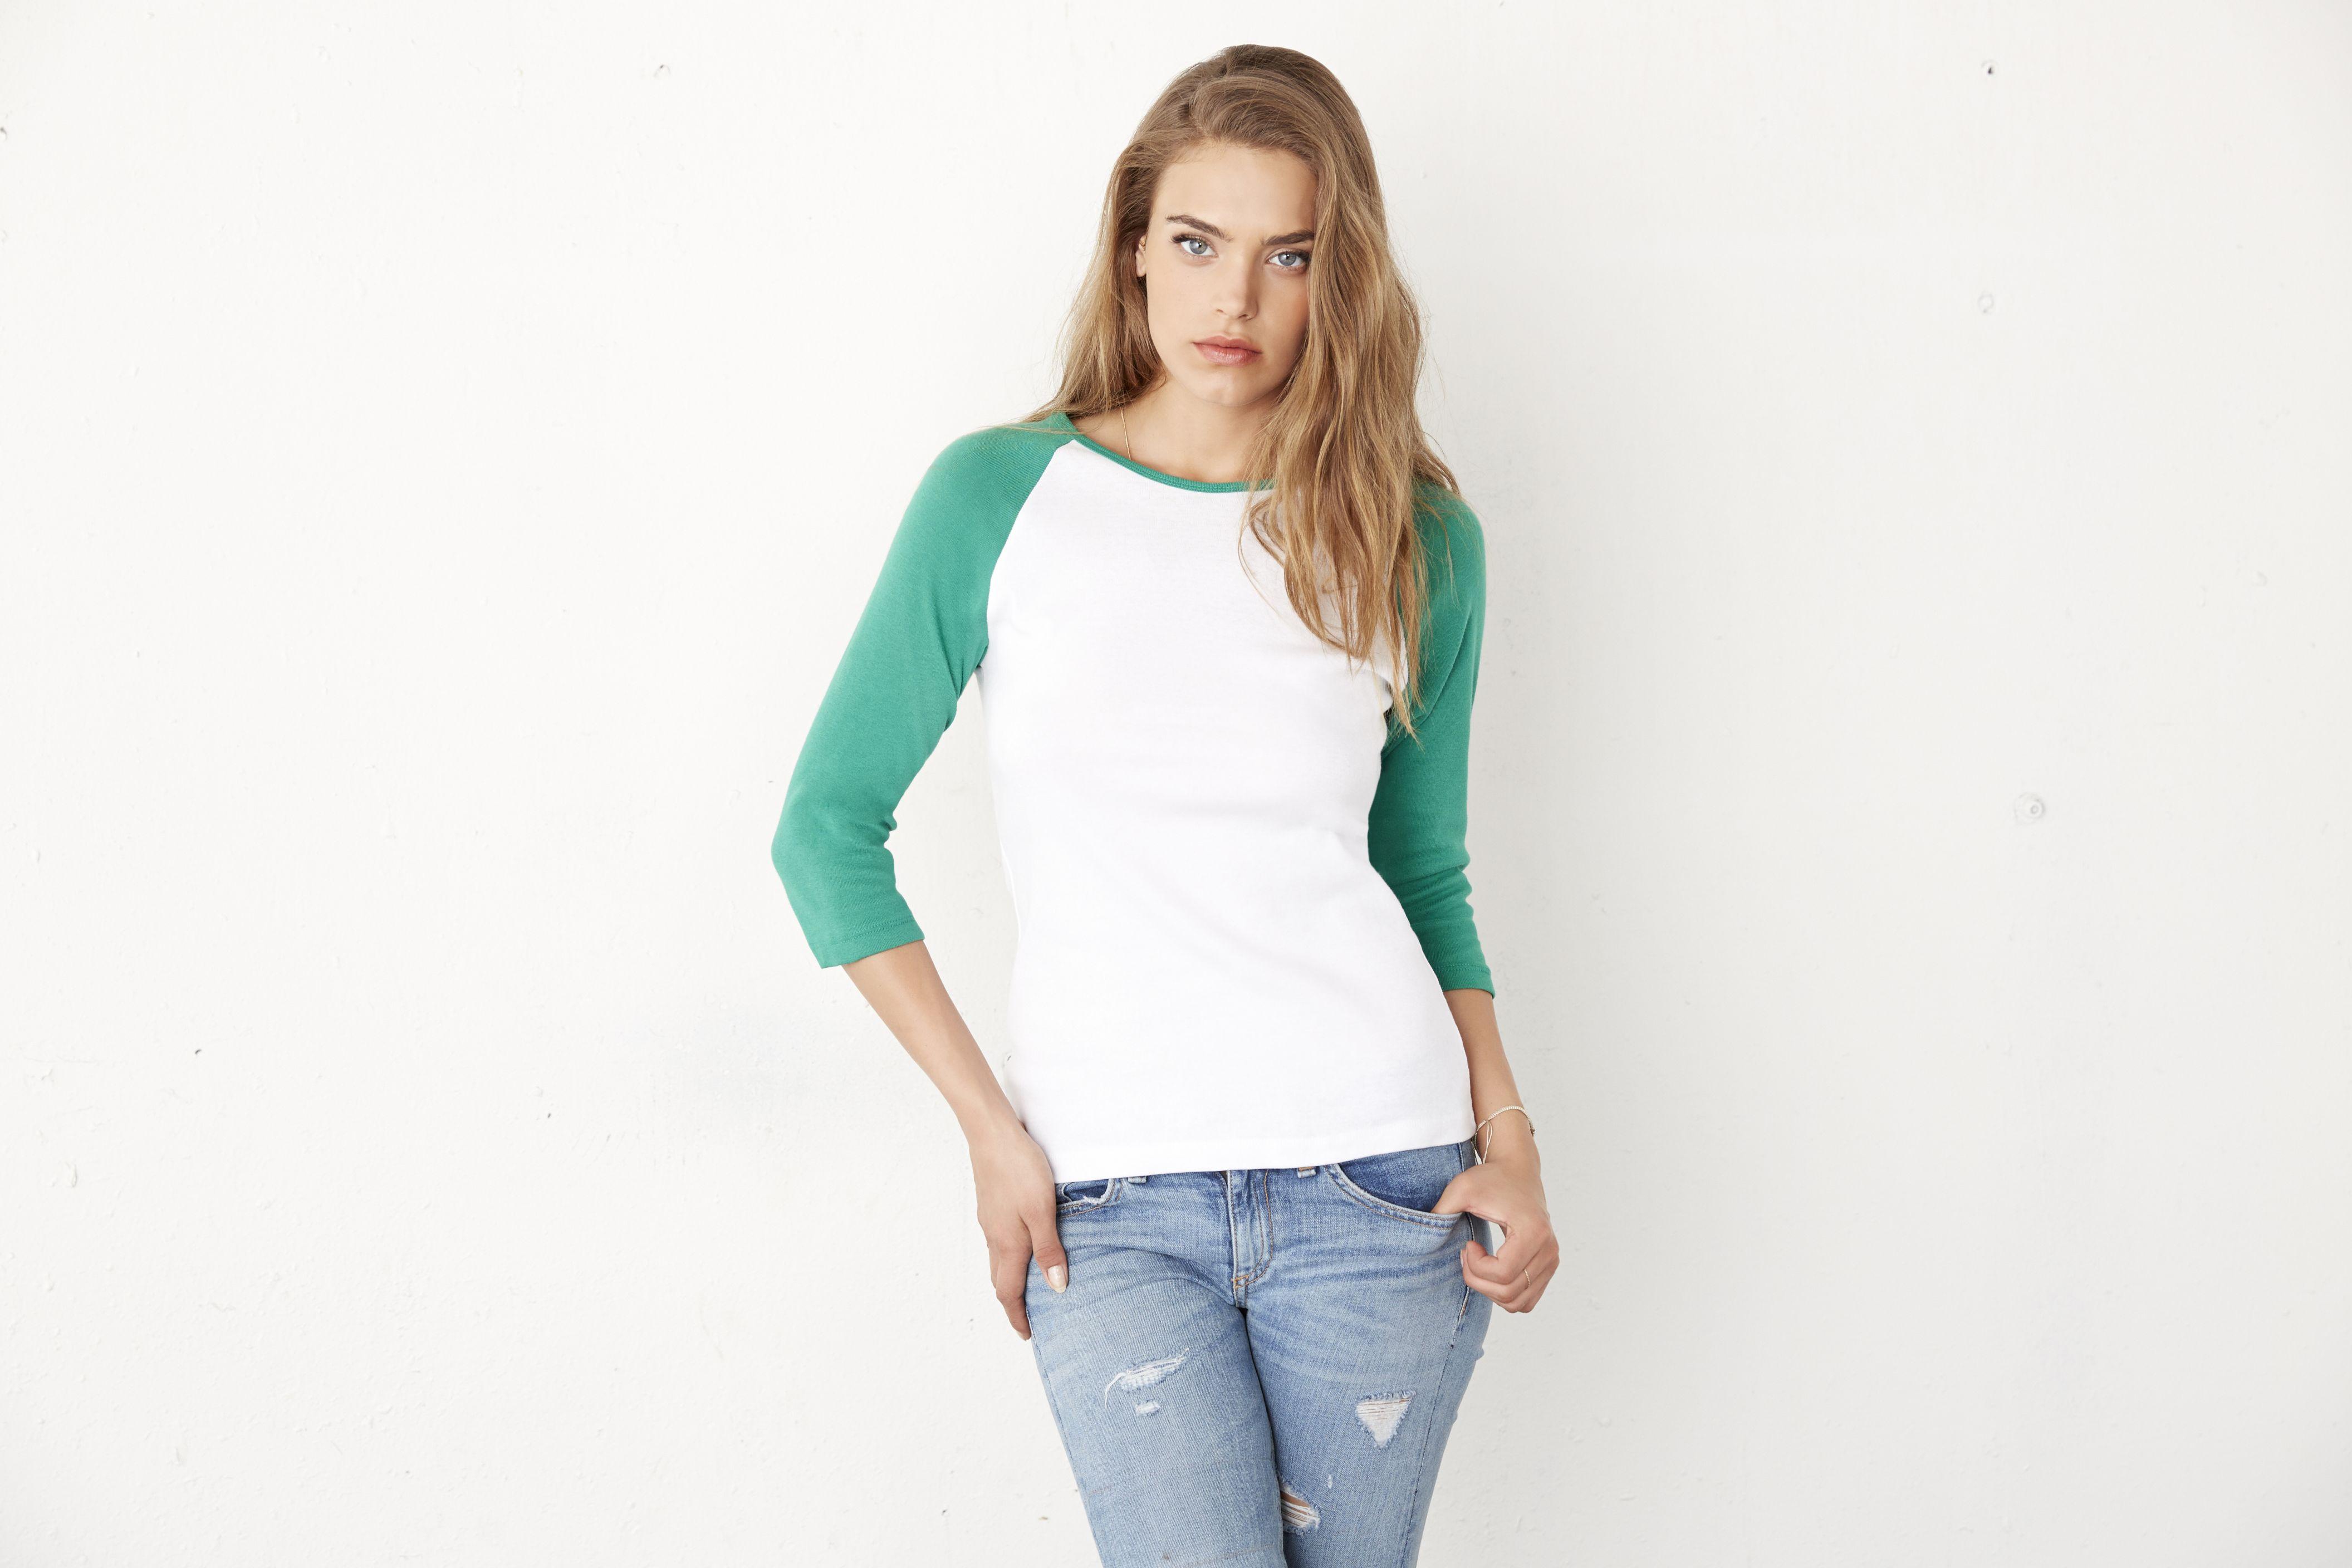 Modna koszulka damska z kolorowymi rękawkami